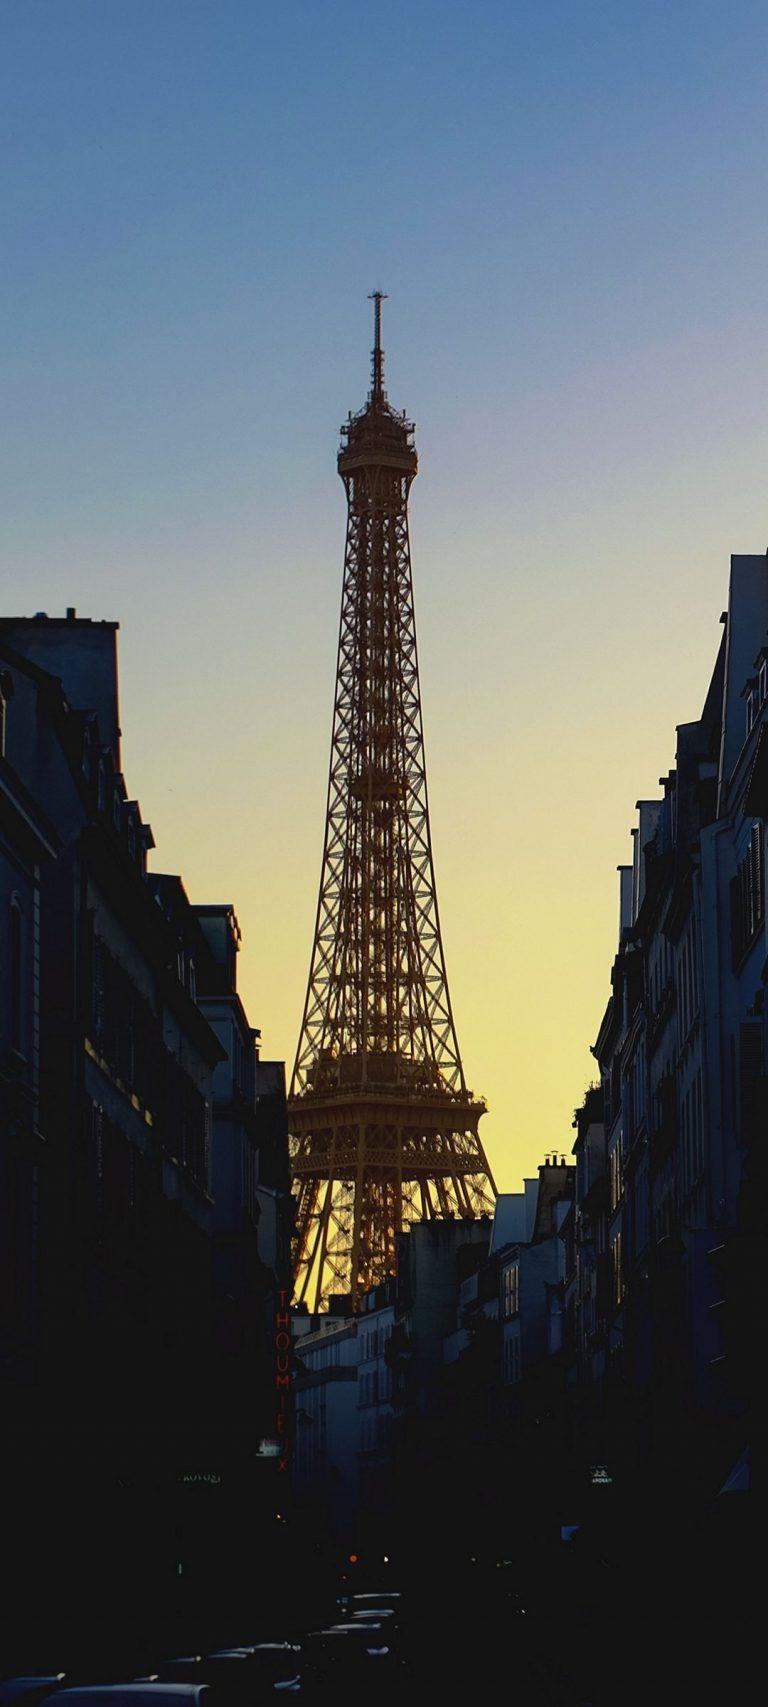 Eiffel Tower France Paris 1080x2400 768x1707